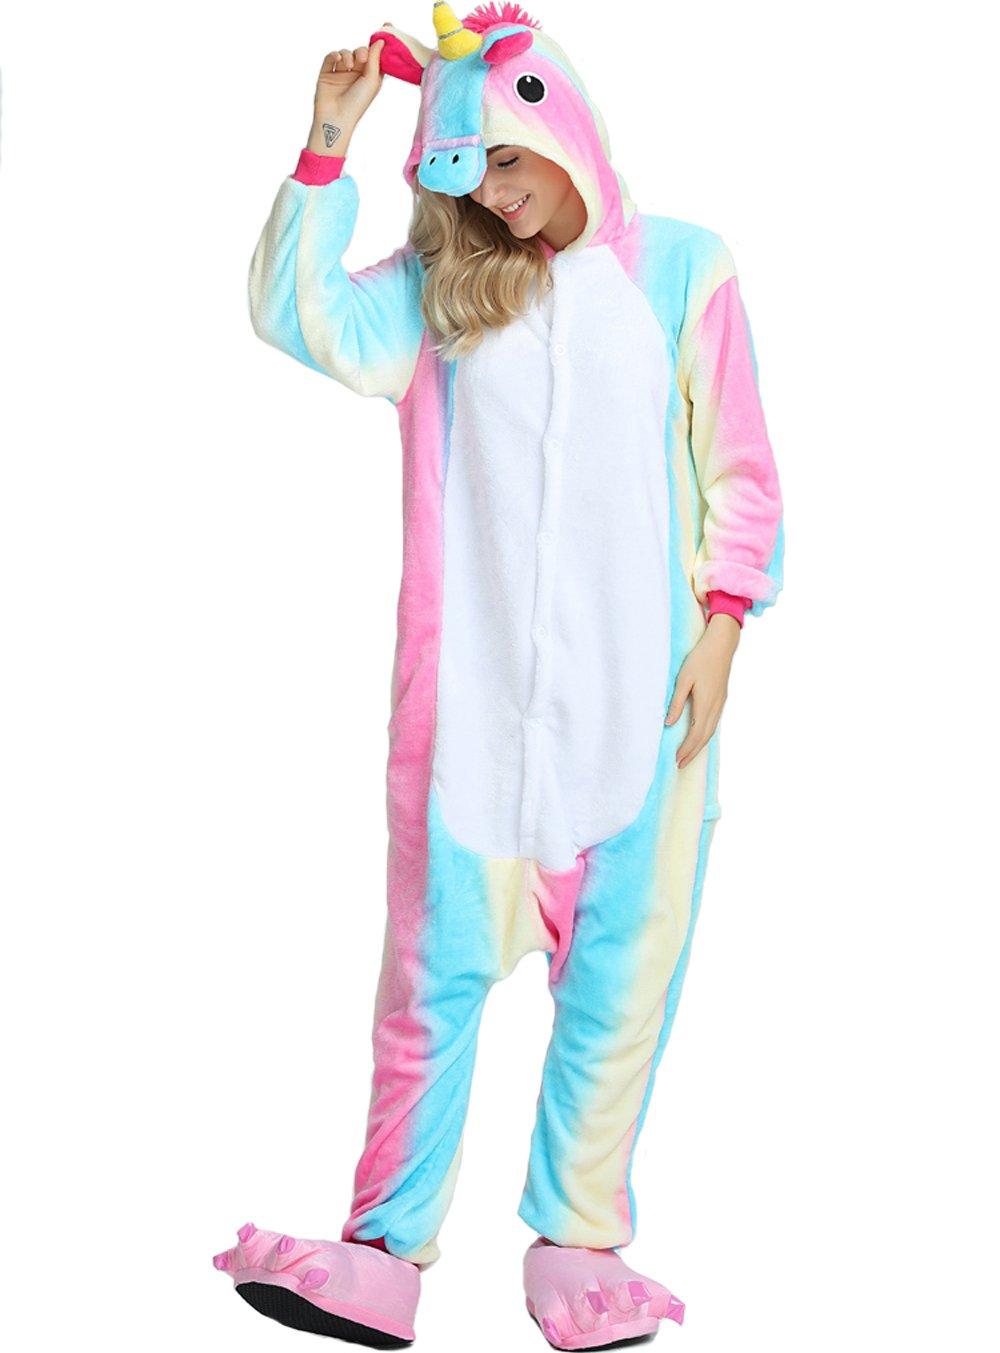 Taiyi Homewear Childrens Unicorn Plush One Piece Onesie Cosplay Animal Costume (12Yrs(height 59''-63''/150cm-160cm), Rainbow Flying Horse)